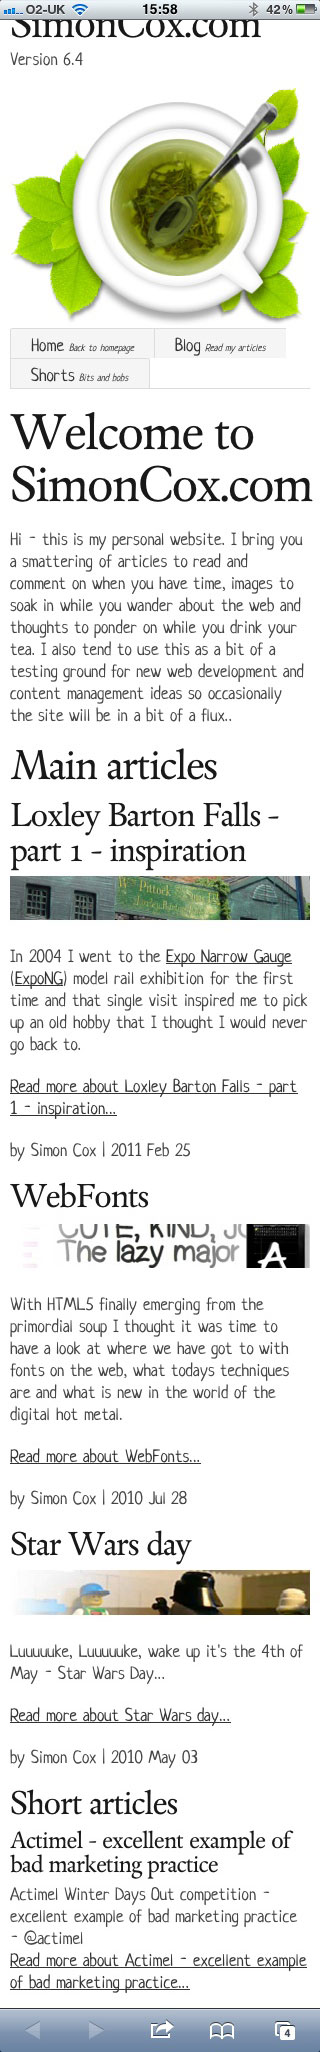 Responsive Web Design iphone screen shot of simoncox.com